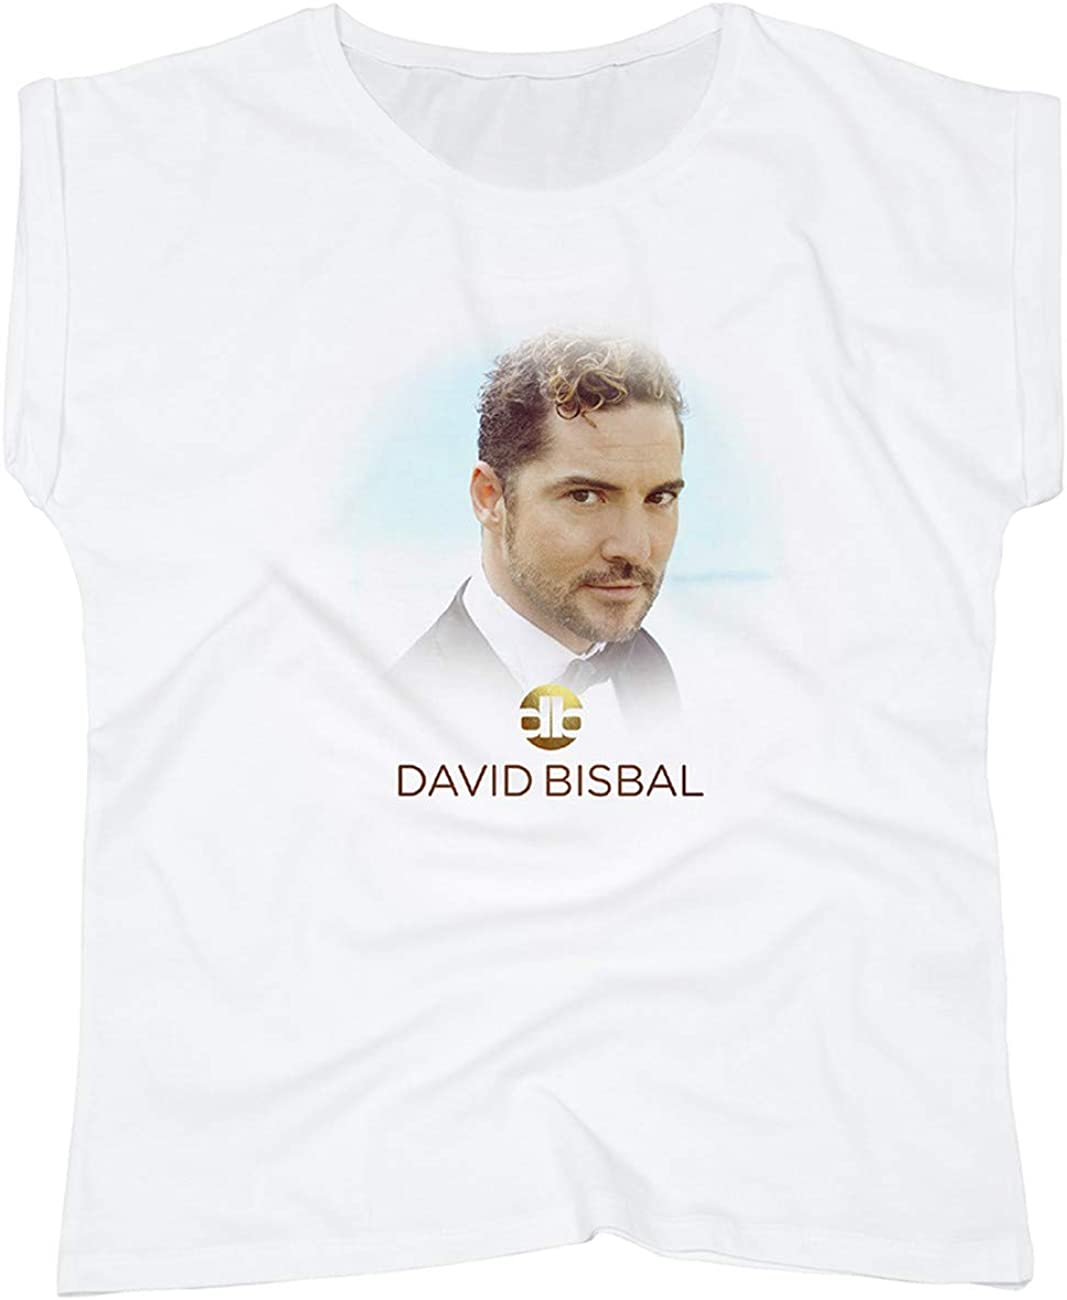 onstage - Camiseta Mujer David BISBAL Imagen Grande Mujer